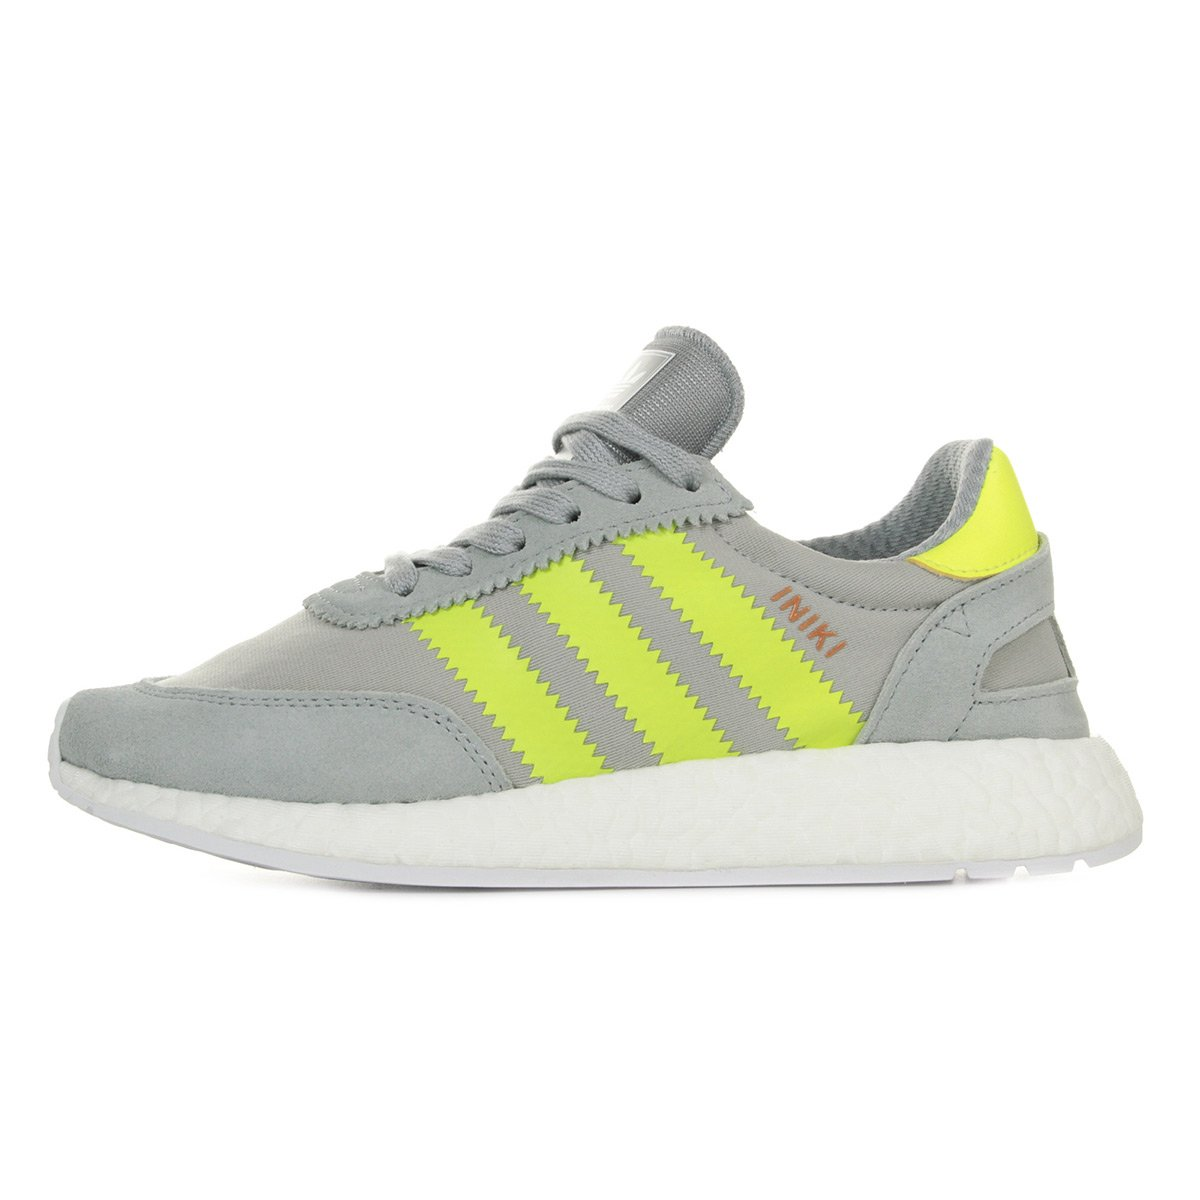 adidas Iniki Runner Damen Schuhe Turnschuhe Sneaker BB0001 Neu  OVP  EU 36|Grau